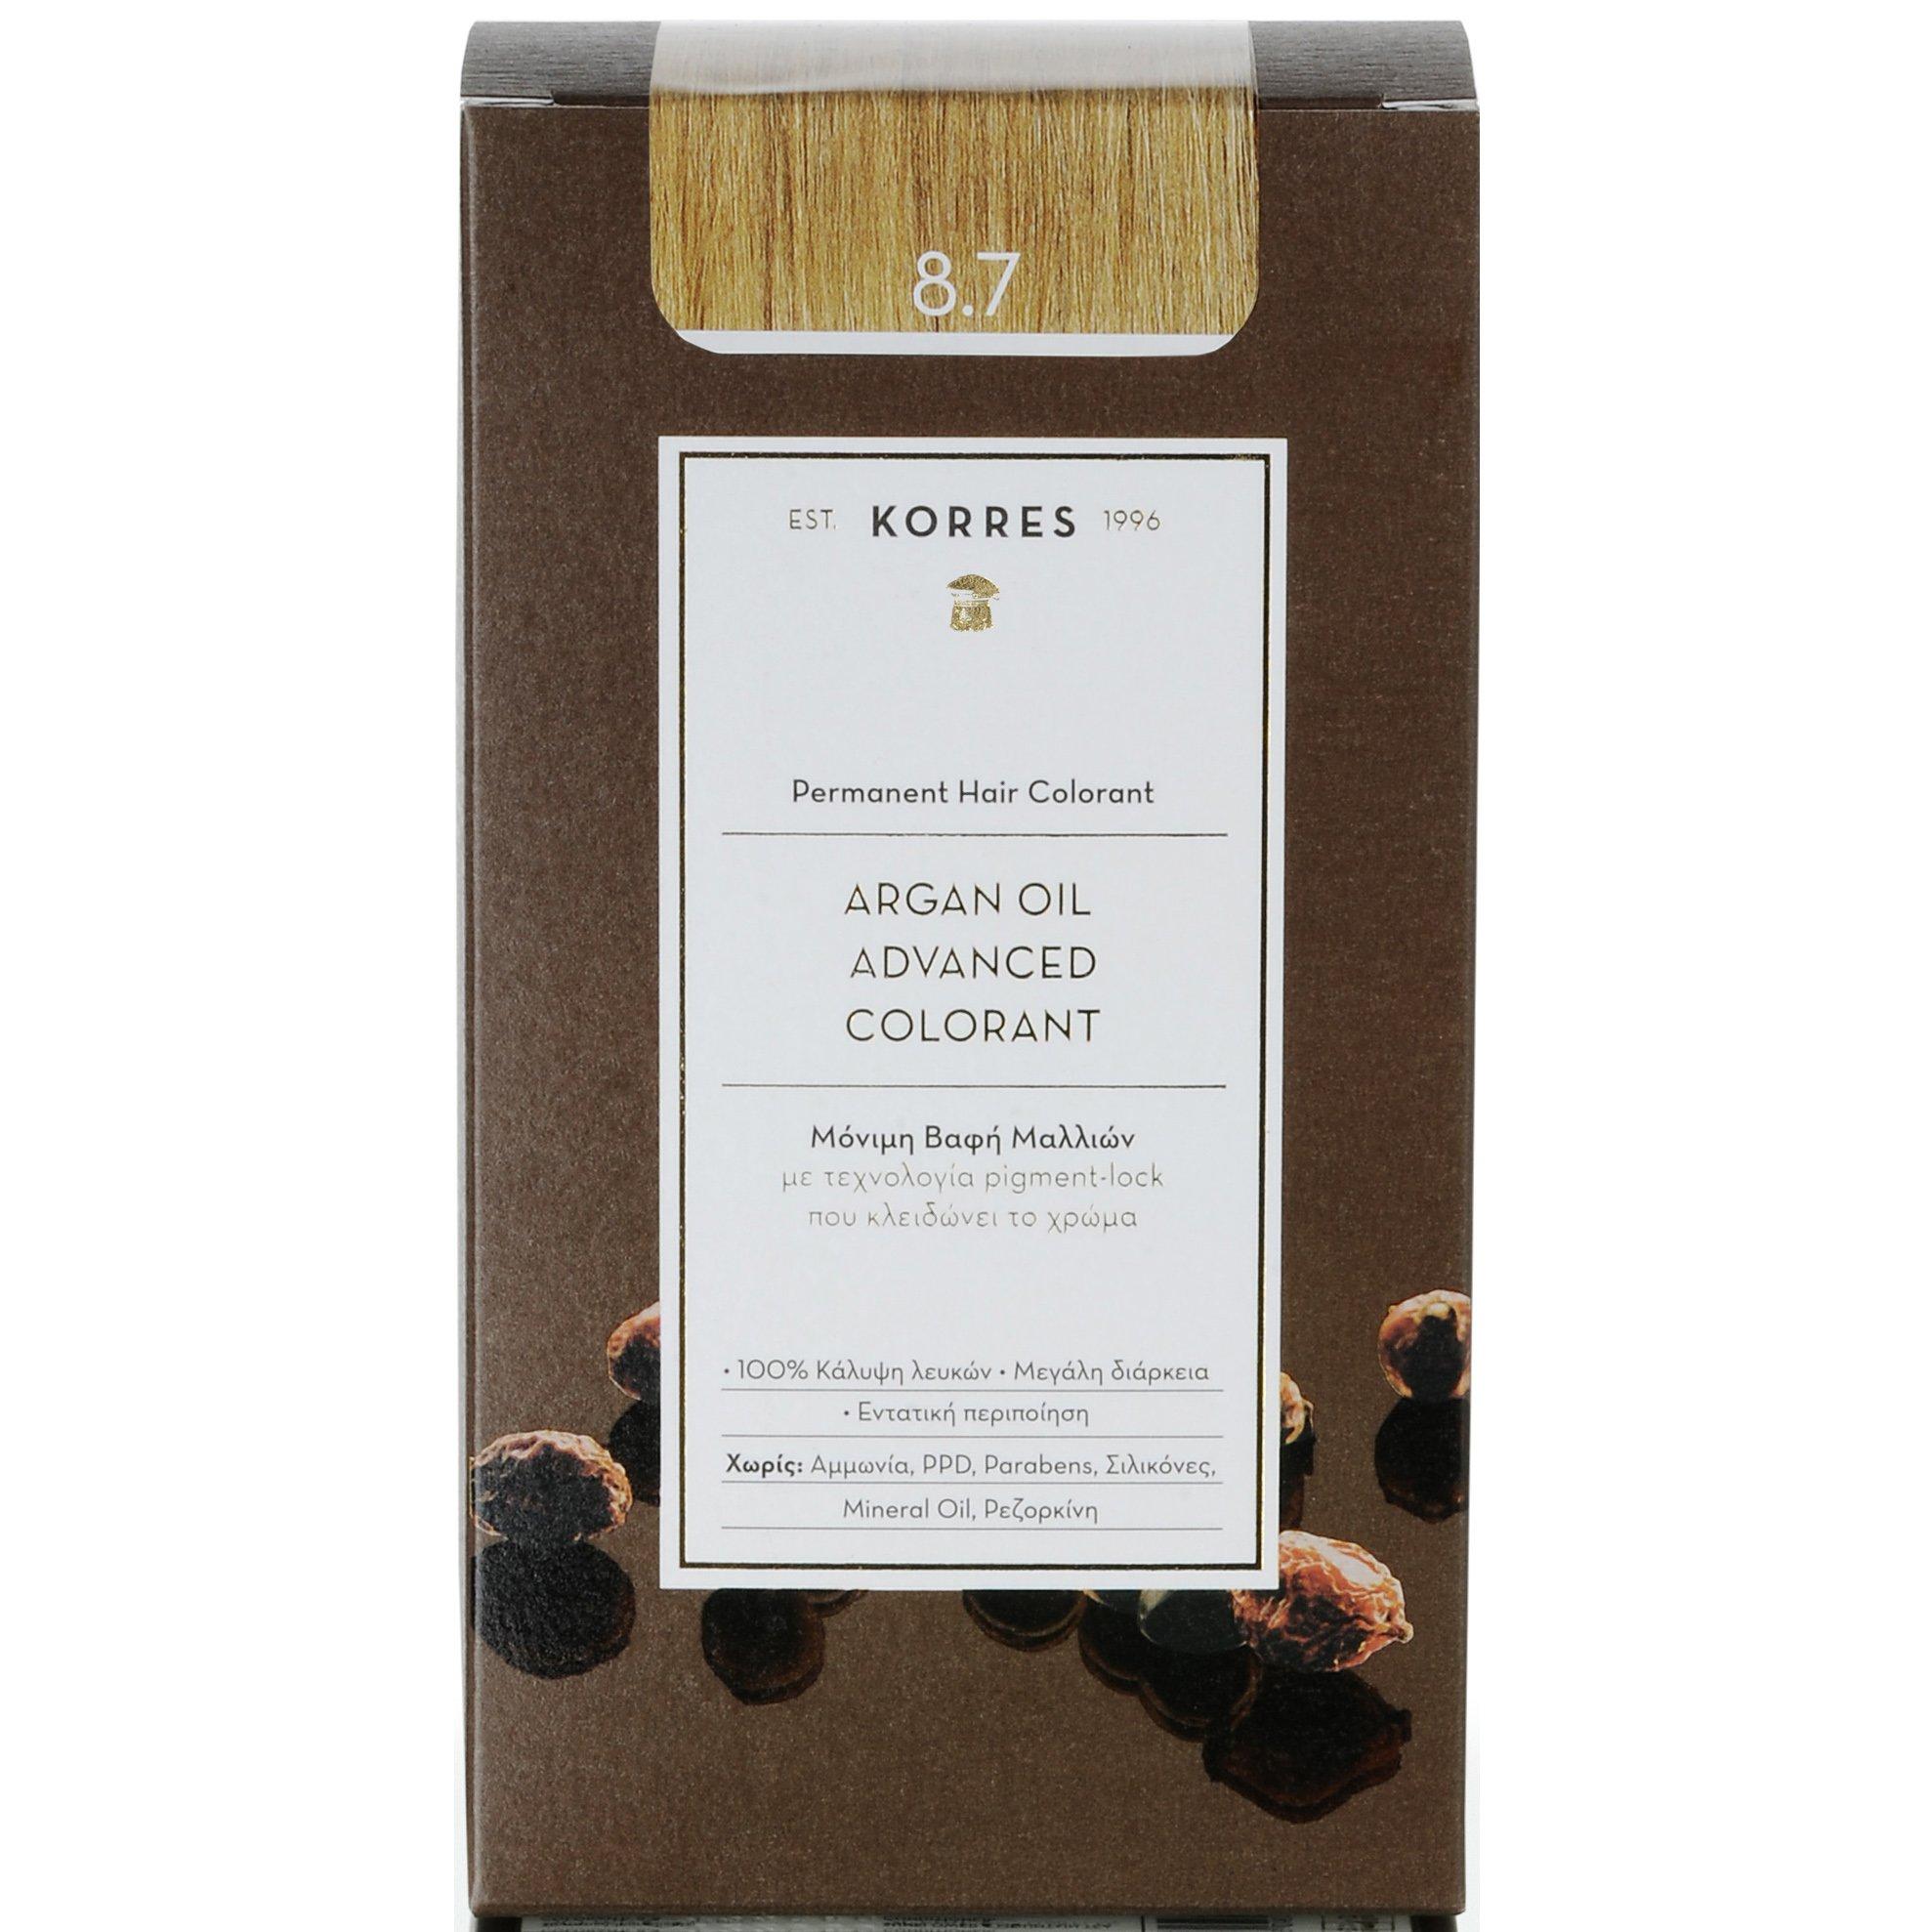 Korres Argan Oil Advanced Colorant Μόνιμη Βαφή Μαλλιών με Τεχνολογία Pigment-Lock που Κλειδώνει το Χρώμα 50ml – 8.7 ΚΑΡΑΜΕΛΑ